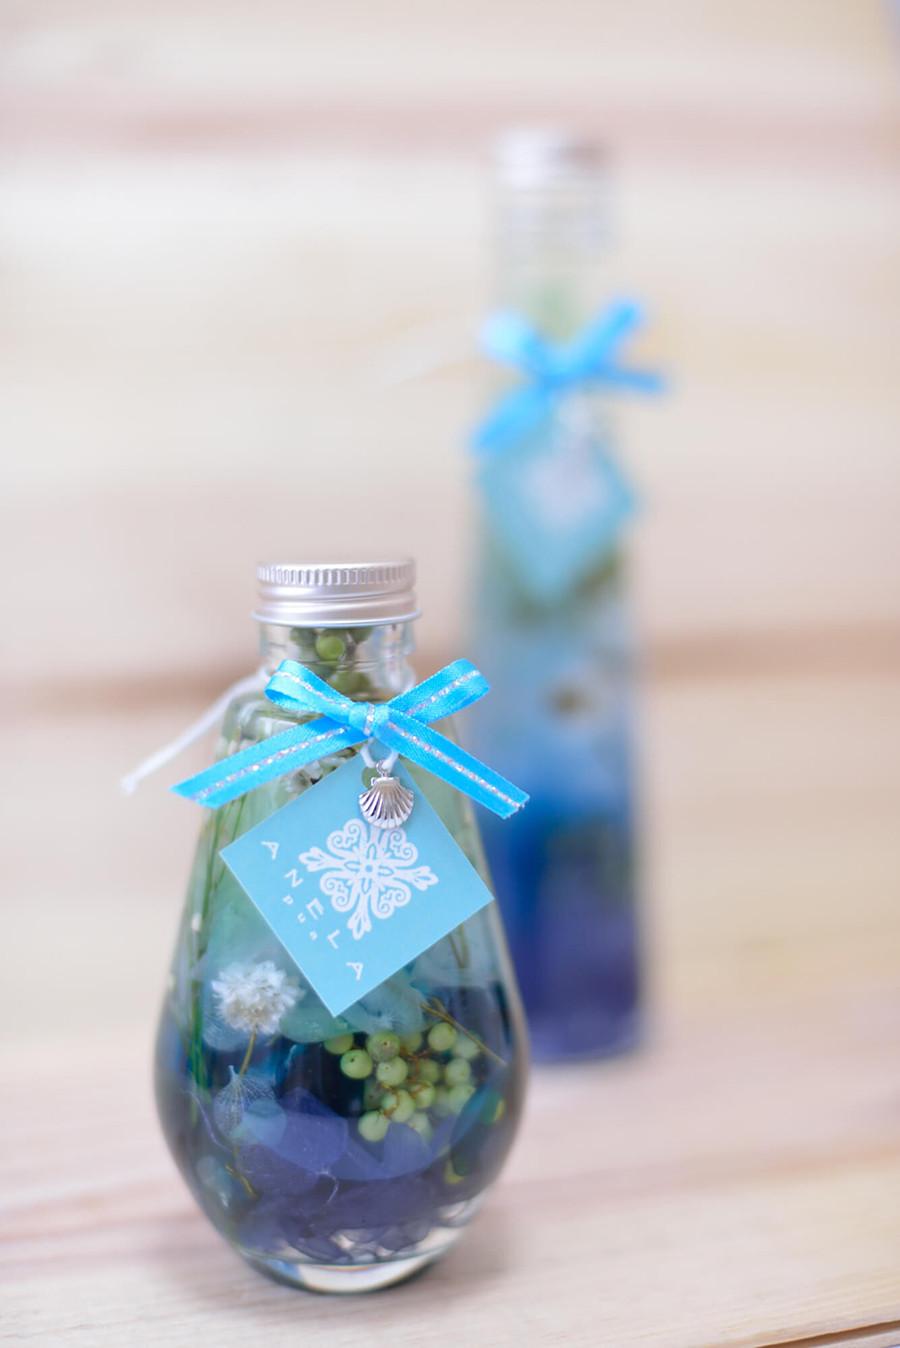 JAMS 「Sea in the Bottle」Short ブルー